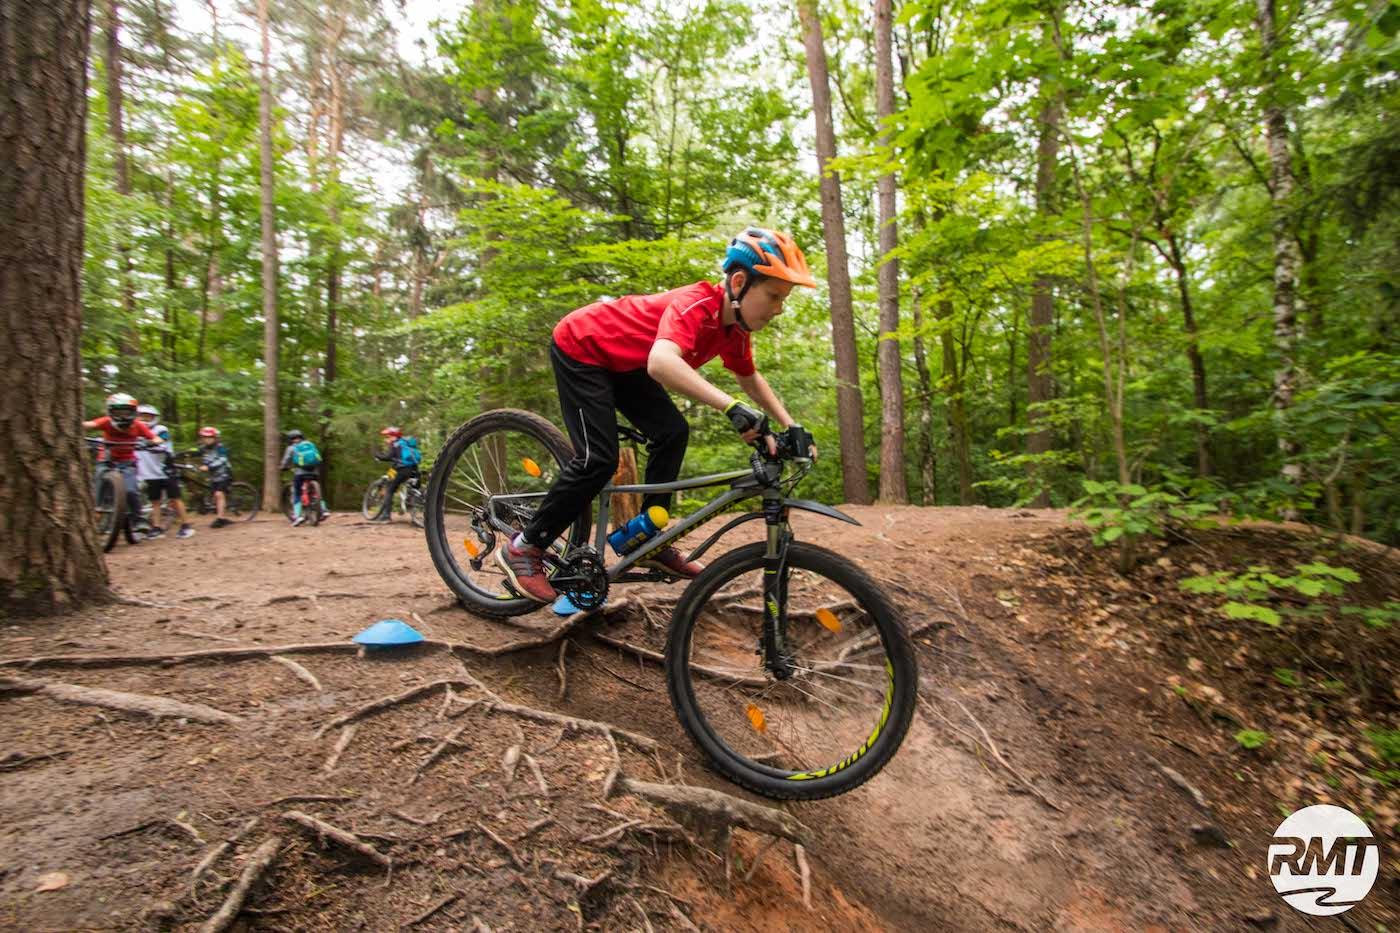 Mountainbike Kinder Kurs in Würzburg - 8-12 Jahre Kids - Rock my Trail Fahrtechnik Bikeschule